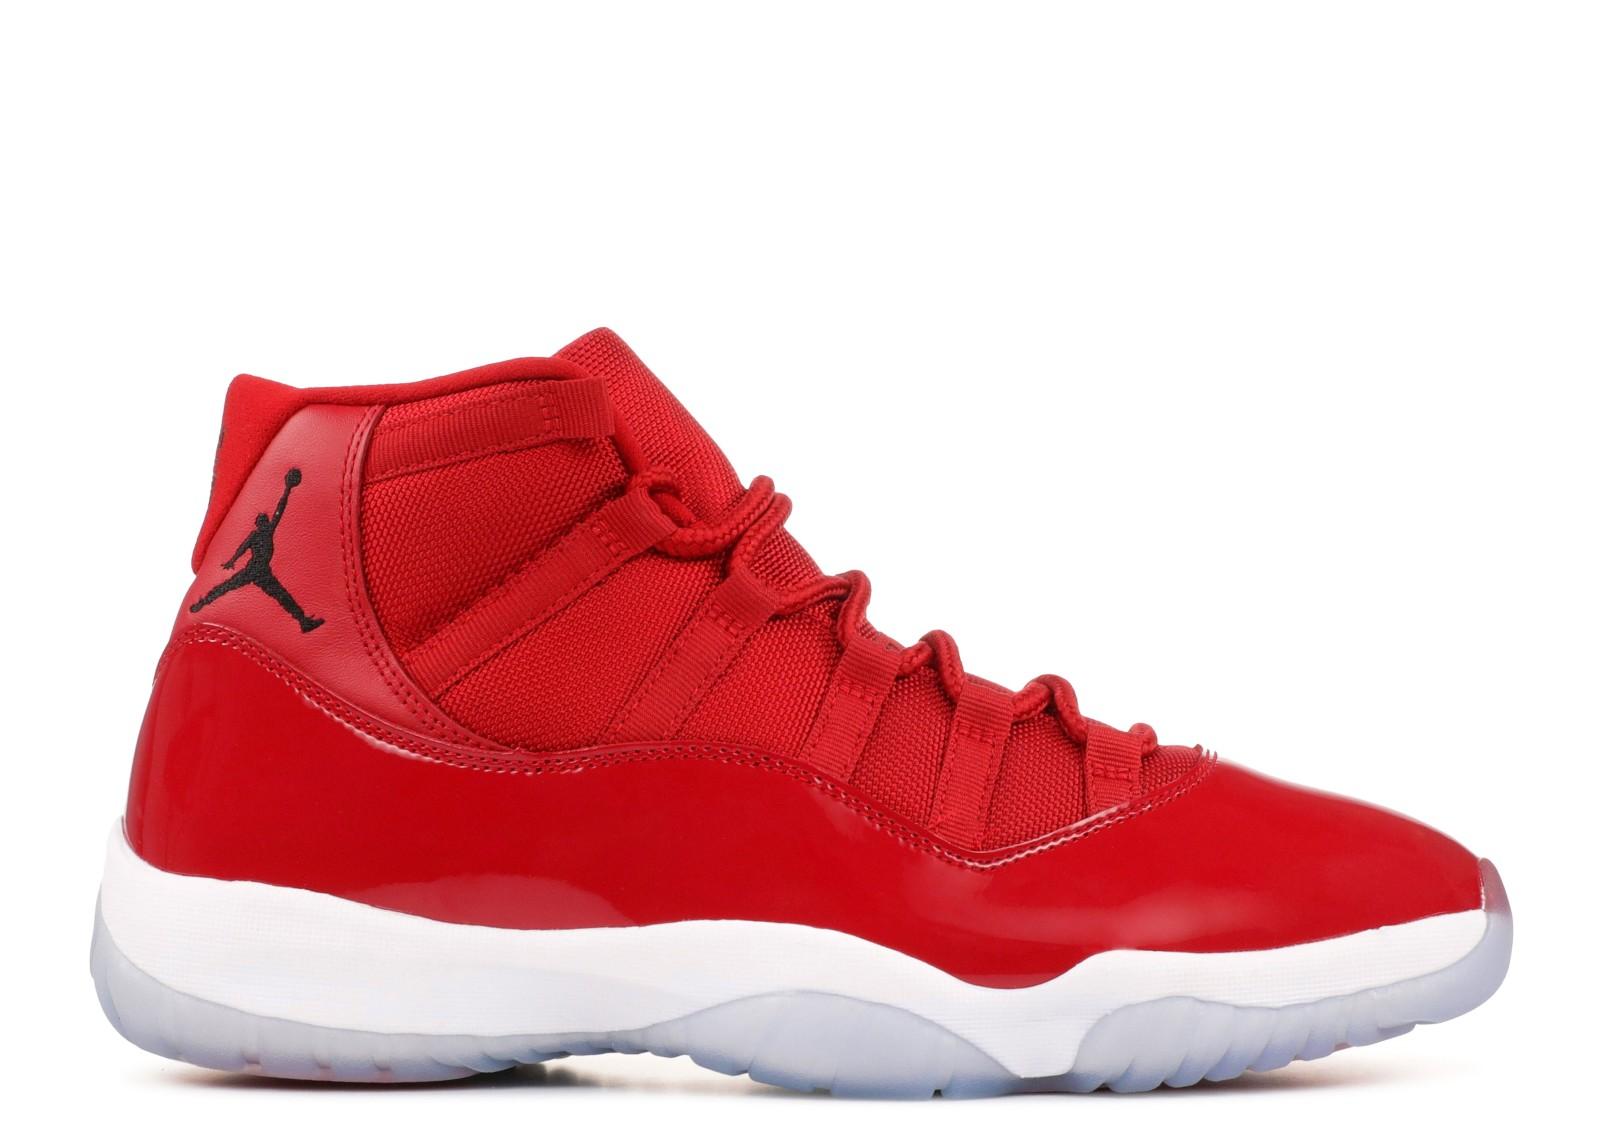 2017 Jordan Releases November